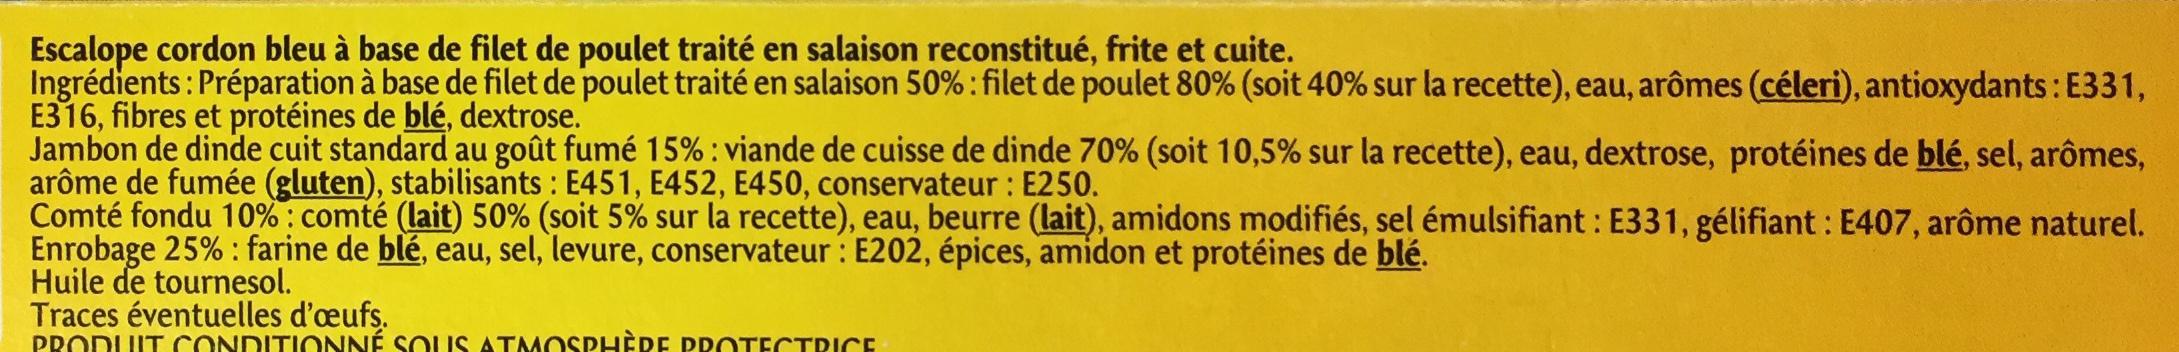 Cordon Bleu au Comté fondu (x 2) - Ingrédients